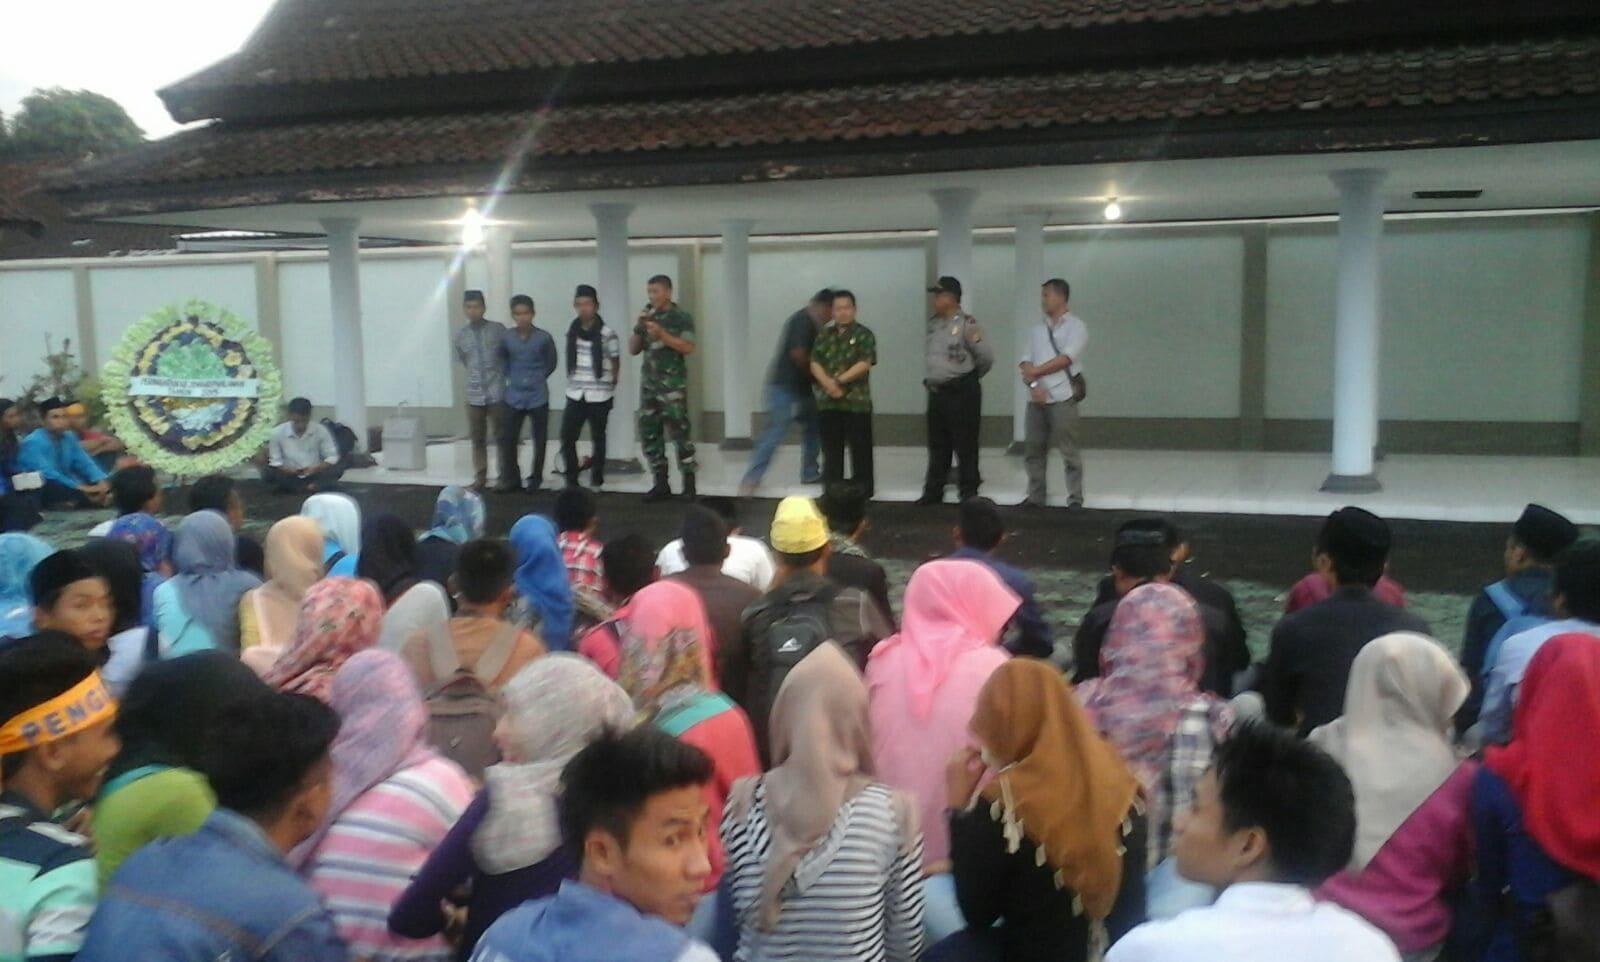 Danrem 162/WB Berikan Tauziah dalam Kegiatan Zikir Dan Do'a Bersama yang Digelar PMII Kota Mataram